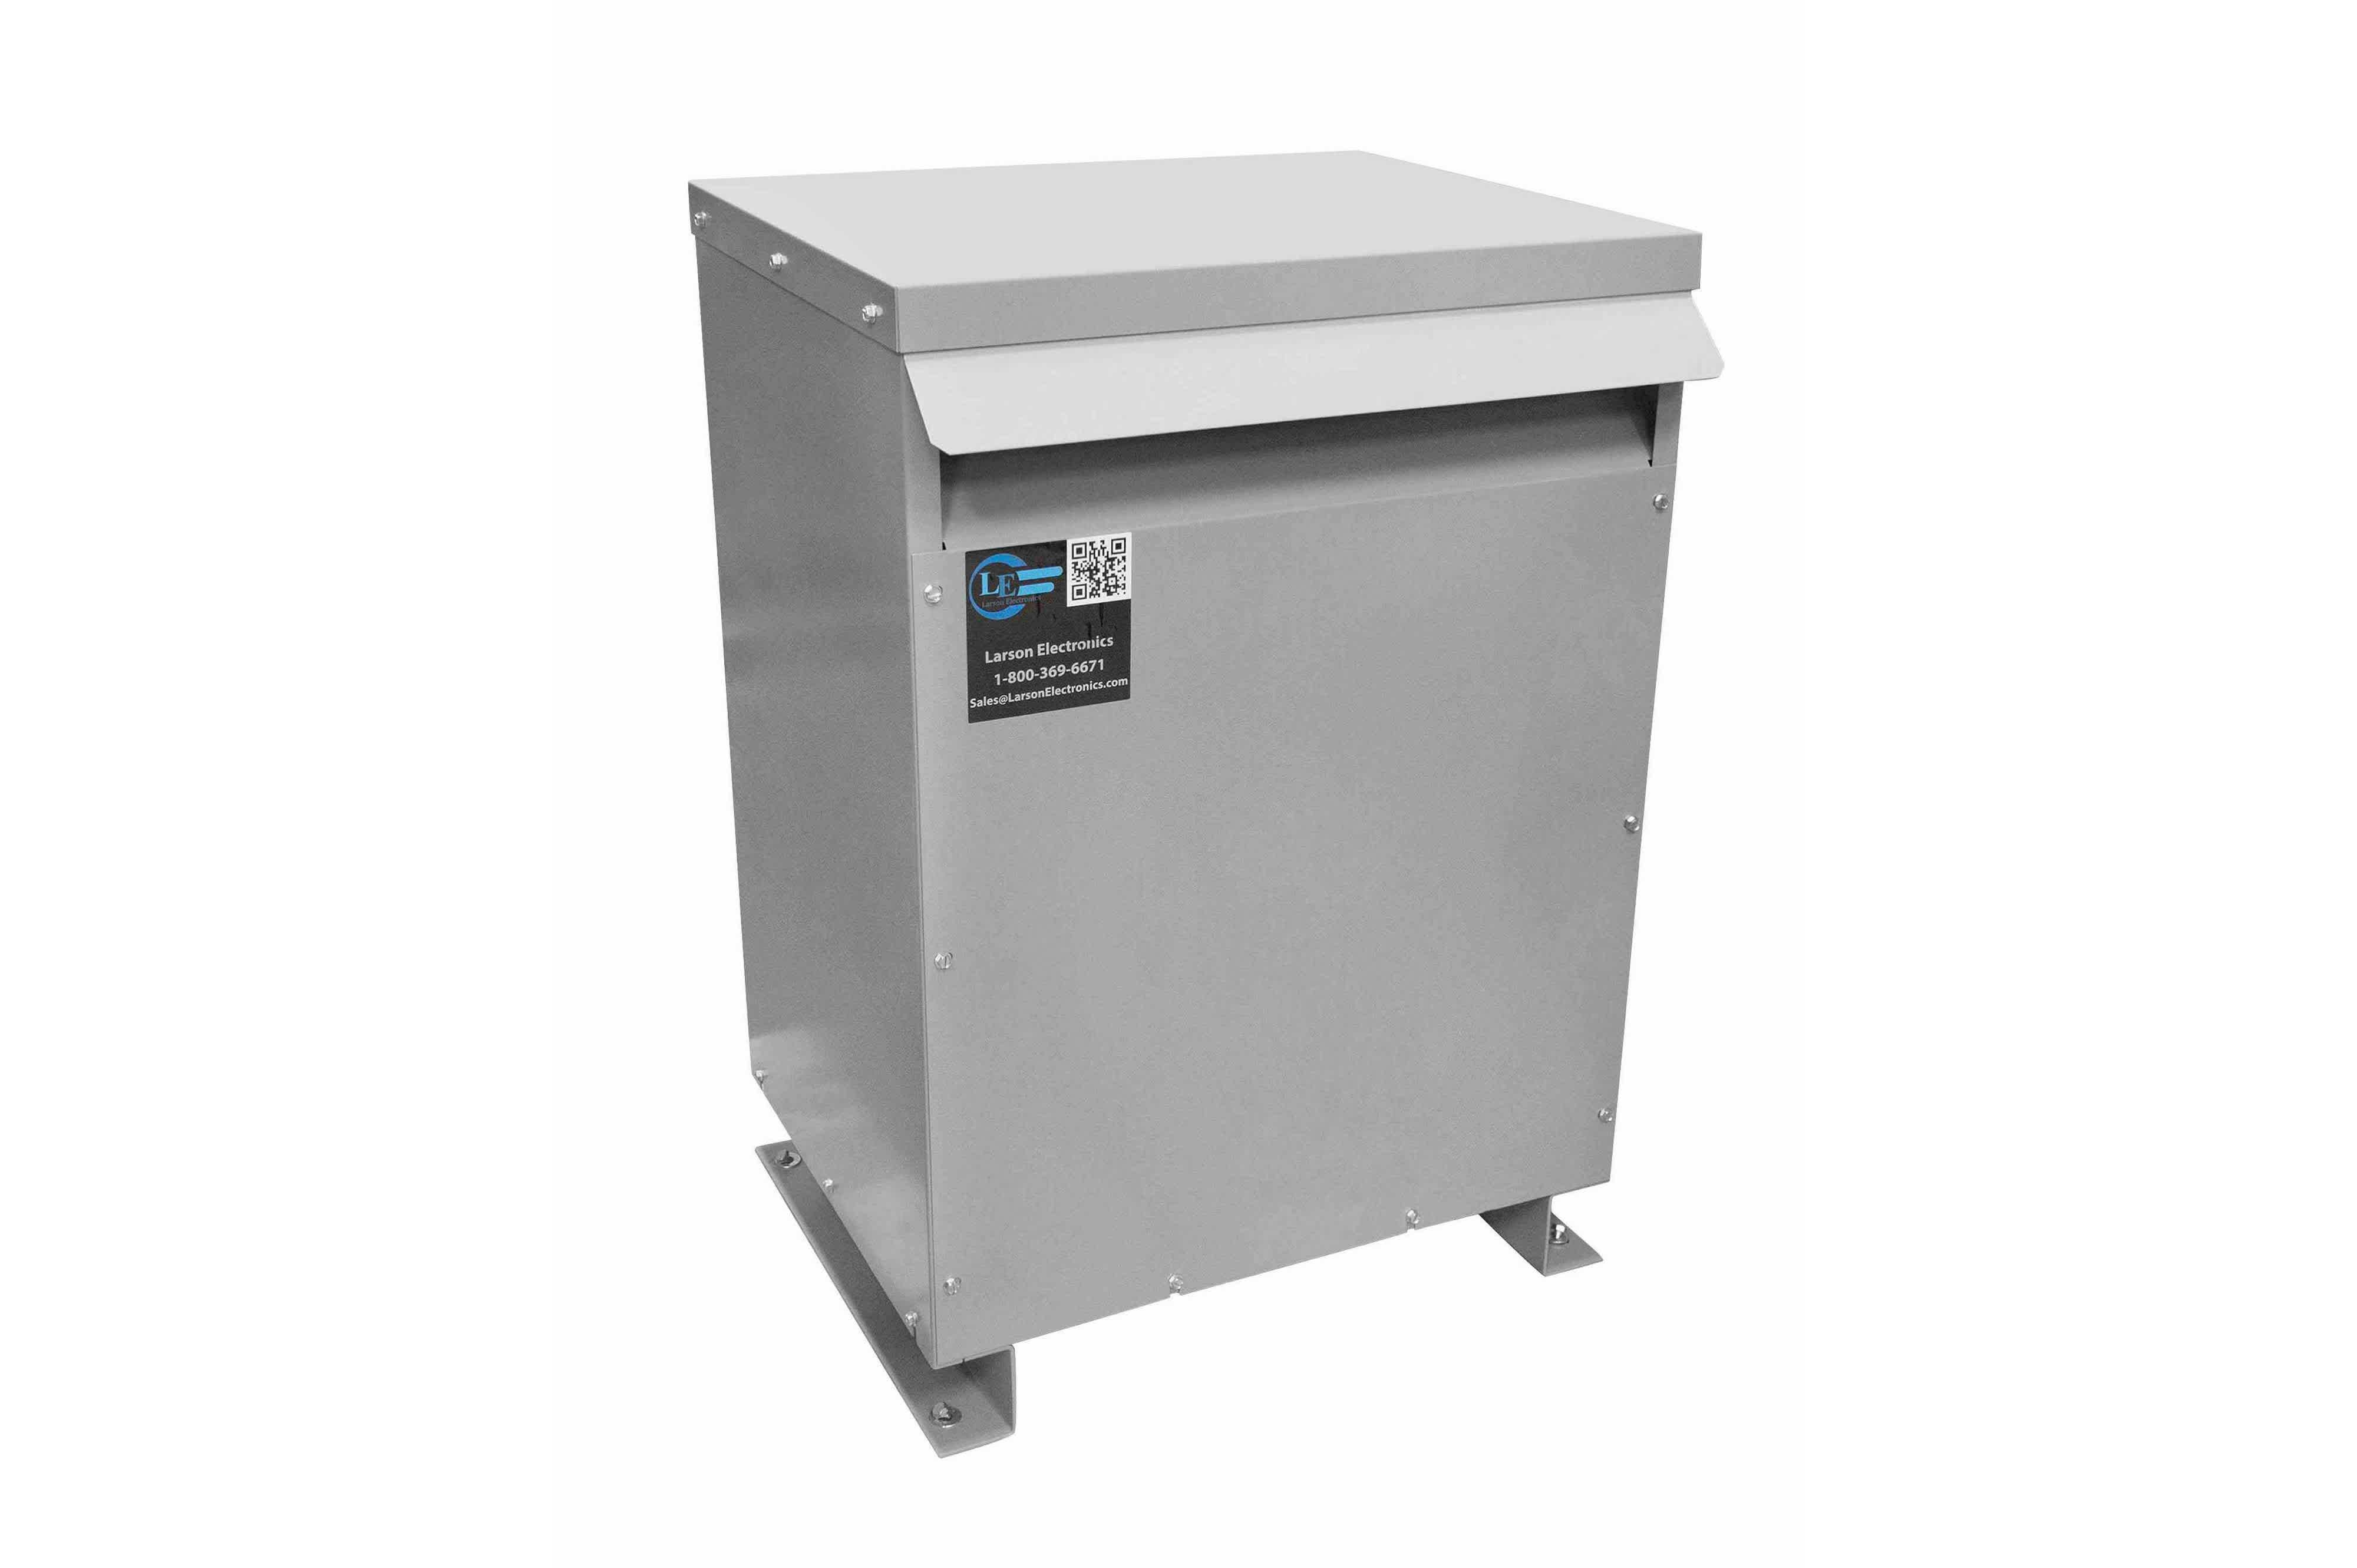 400 kVA 3PH Isolation Transformer, 480V Wye Primary, 575V Delta Secondary, N3R, Ventilated, 60 Hz